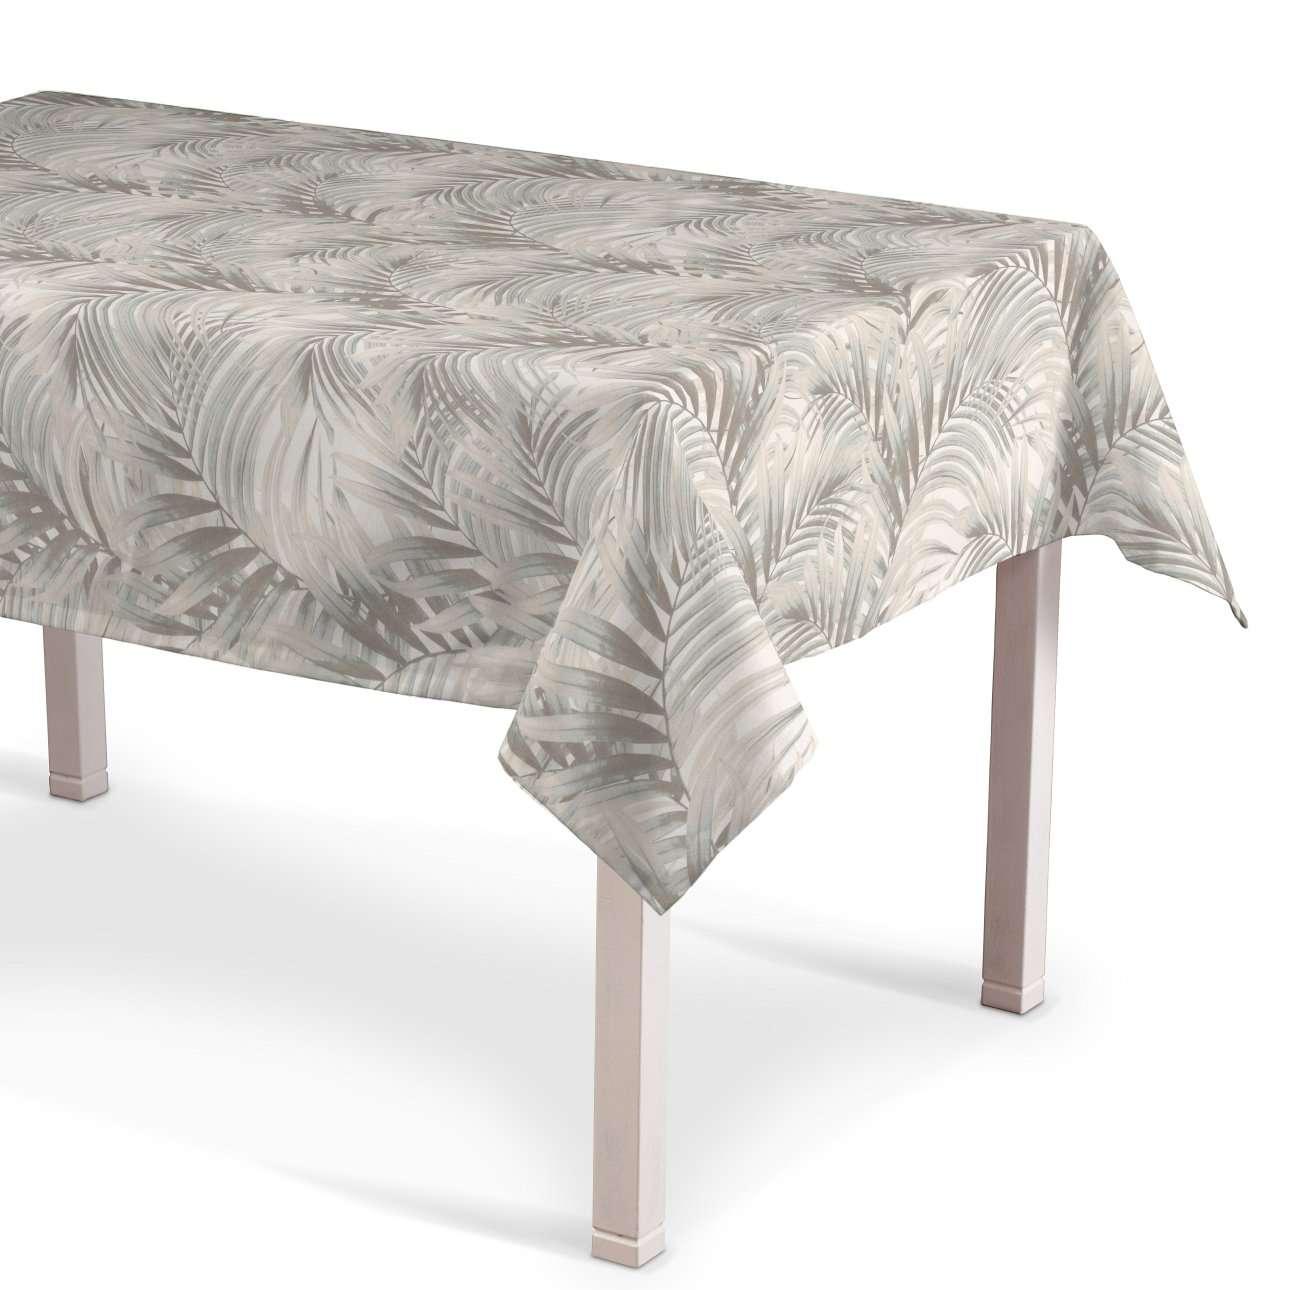 Rectangular tablecloth in collection Gardenia, fabric: 142-14